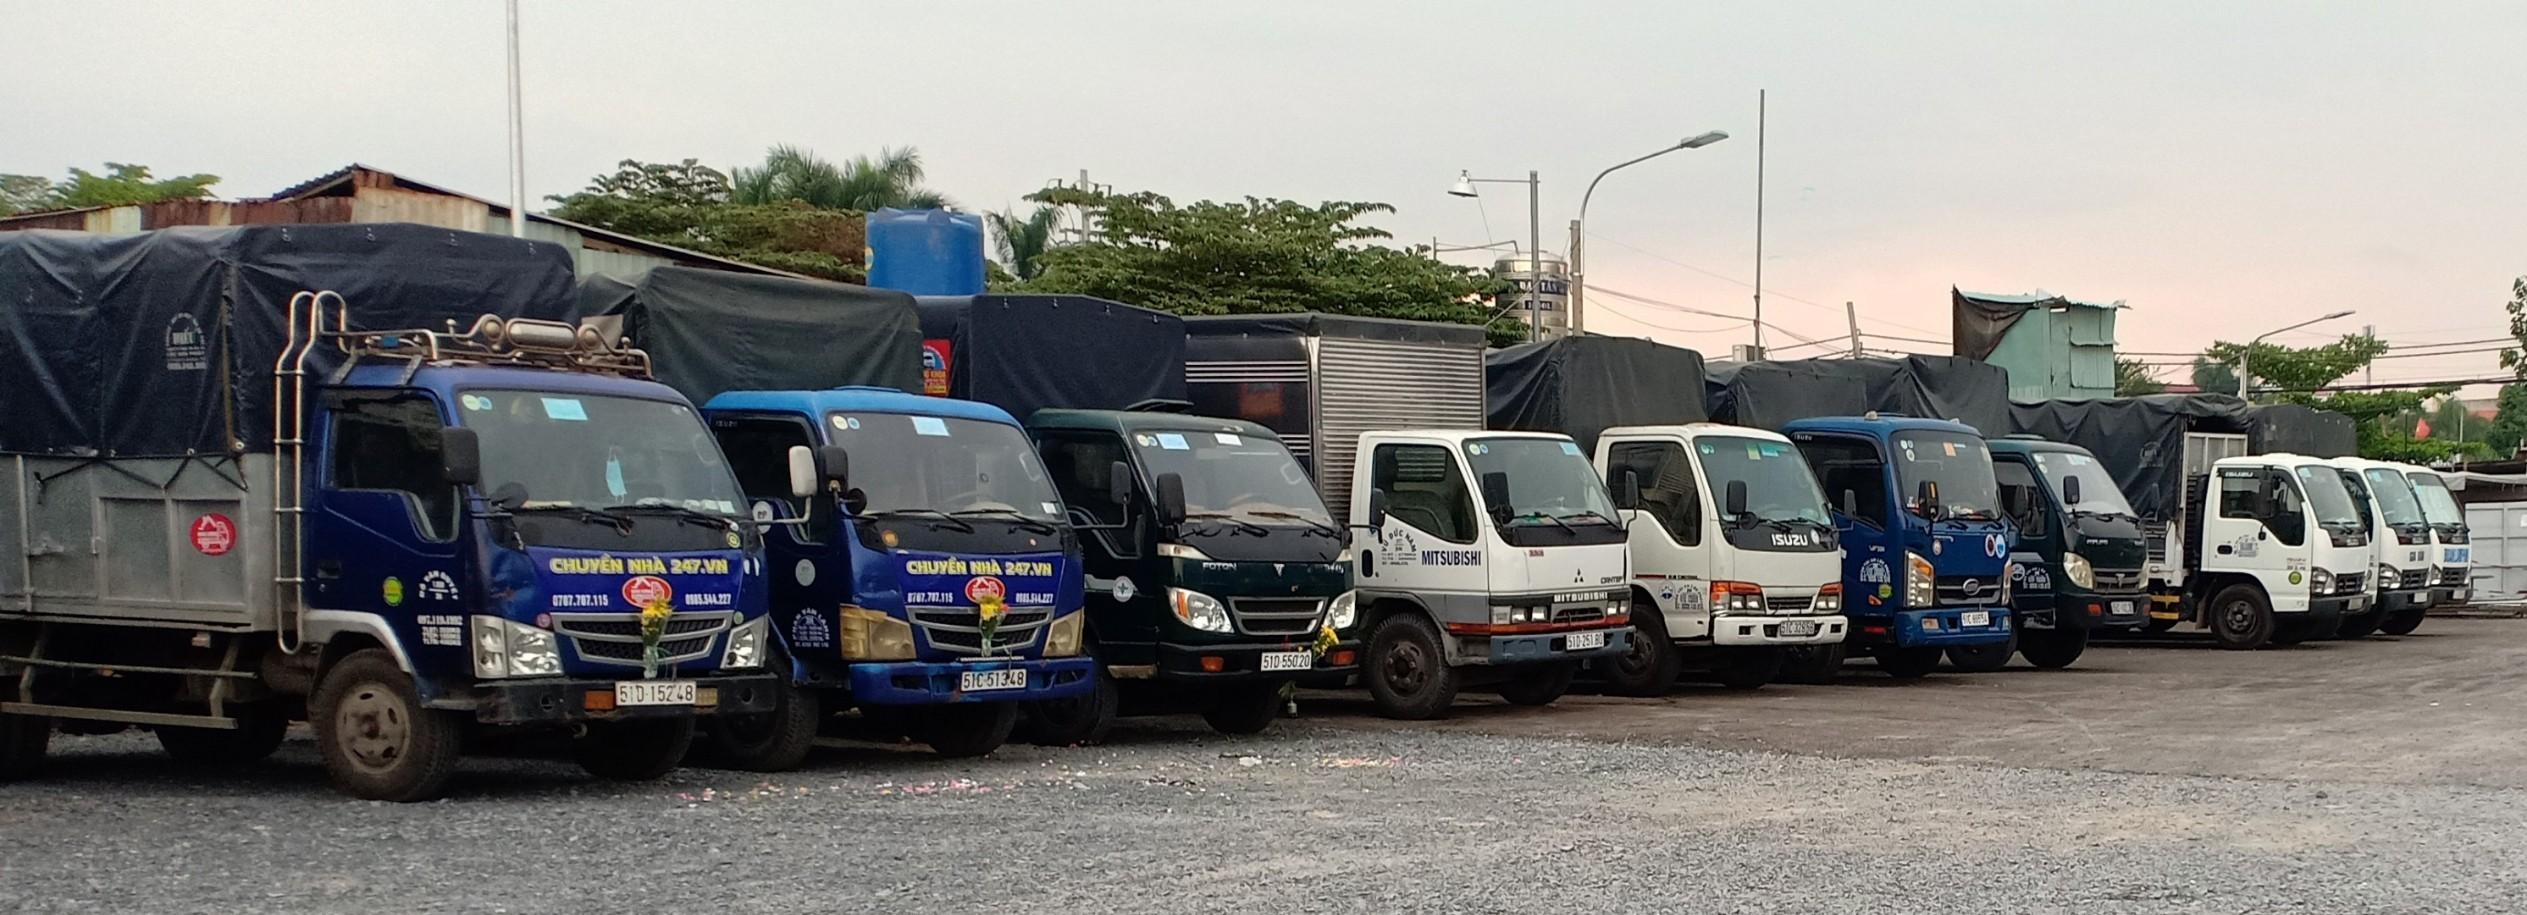 thuê taxi tải quận 10